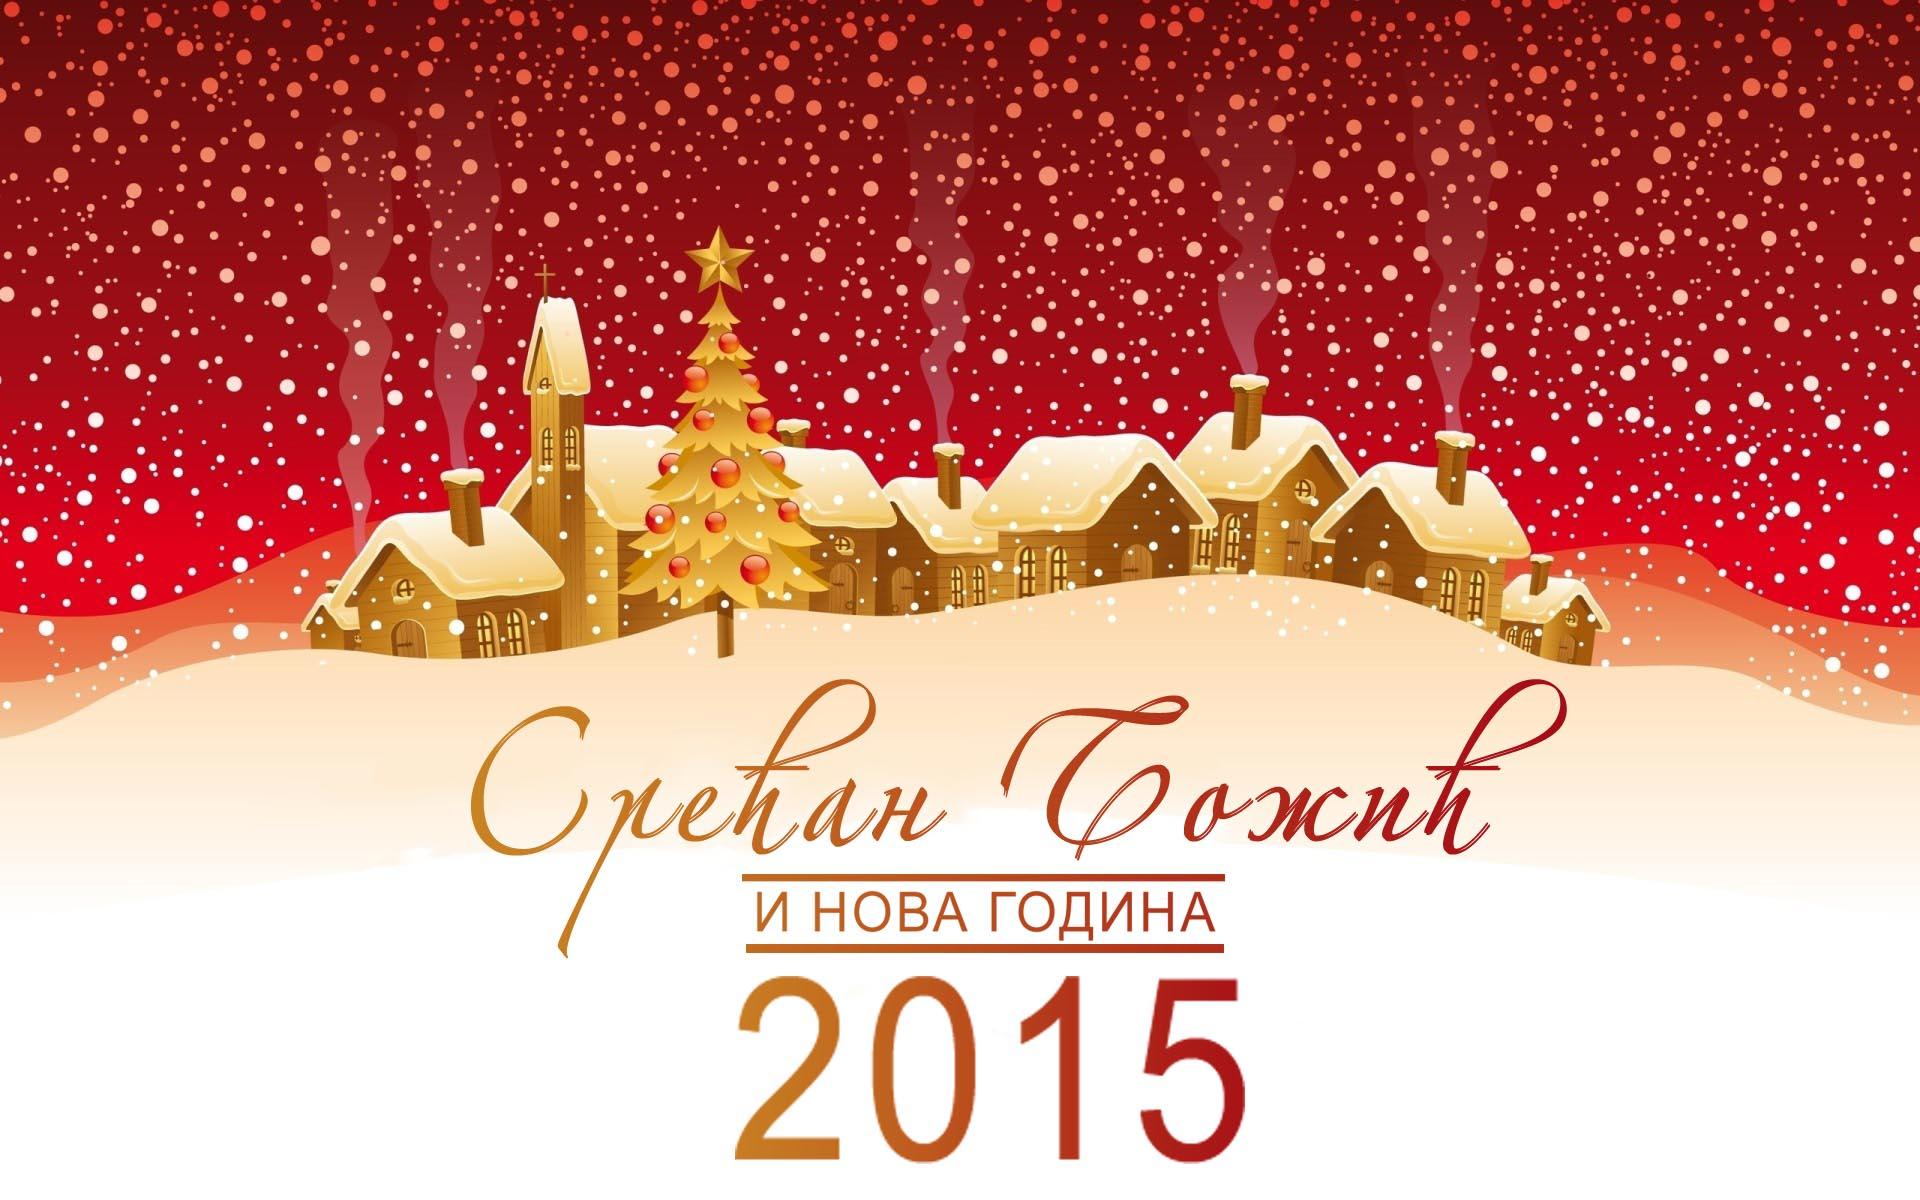 http://vukkaradzic.rs/download/2015.jpg